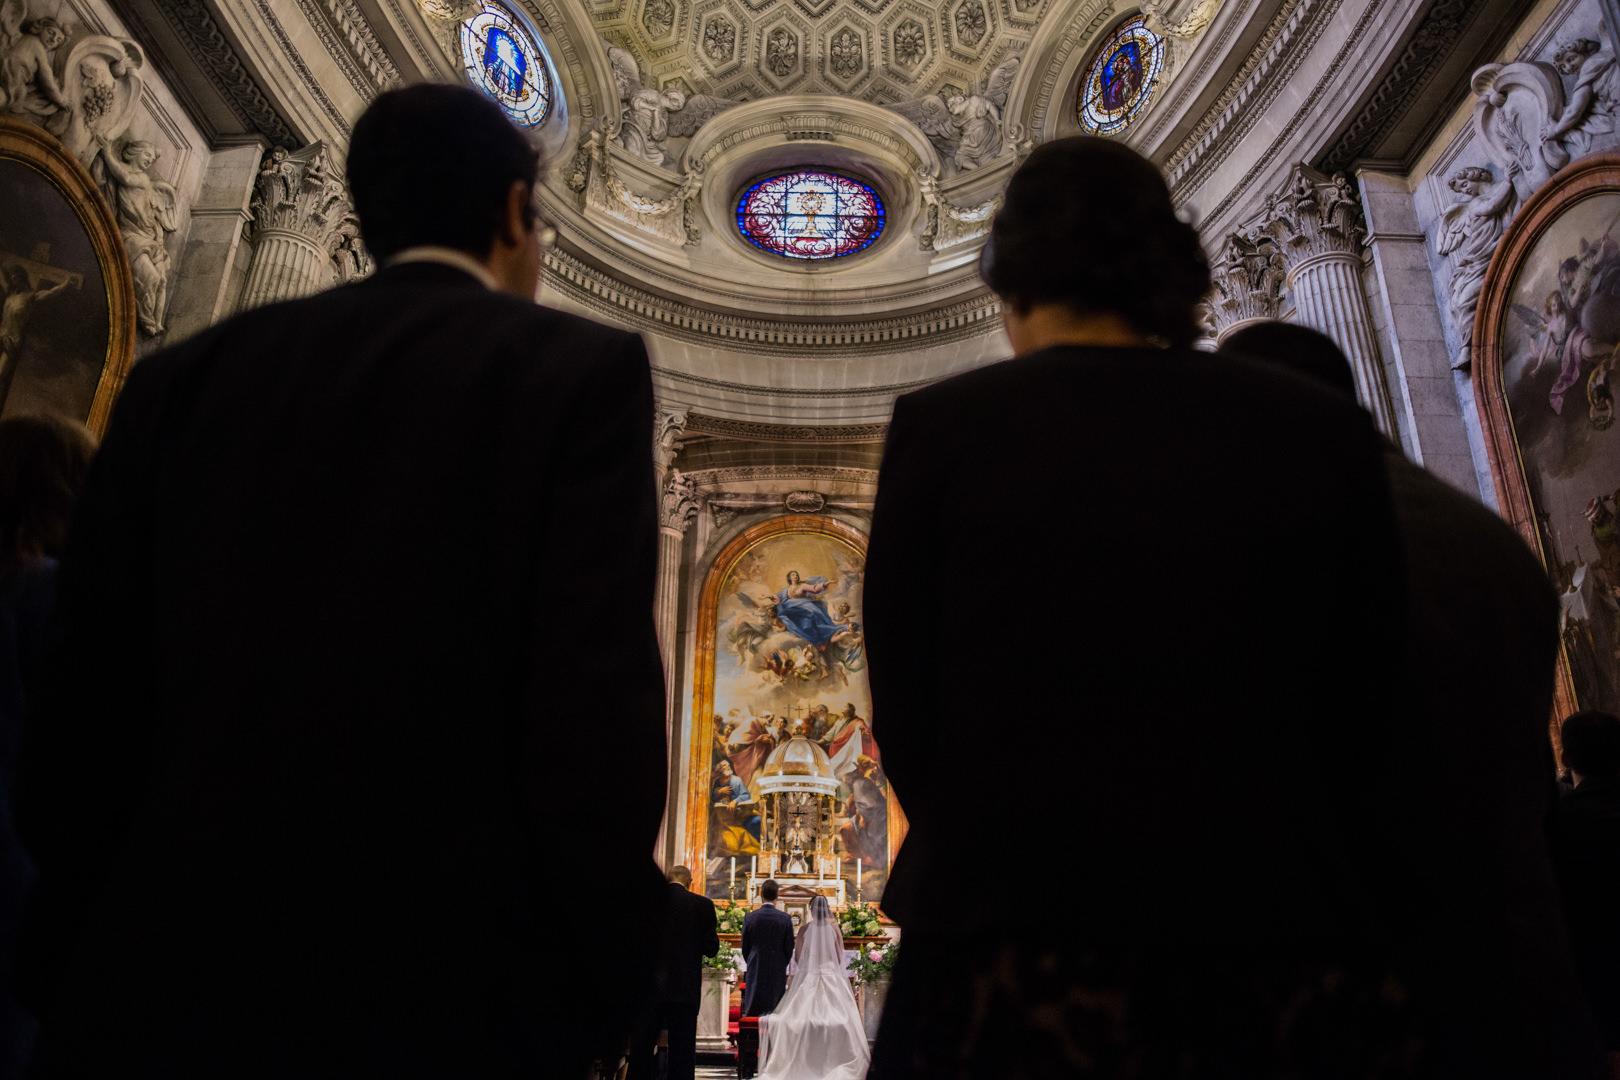 Boda-Catedral-Jaen-Hamburgo-Maria-David-engagement-Rafael-Torres-fotografo-bodas-sevilla-madrid-barcelona-wedding-photographer--21.jpg